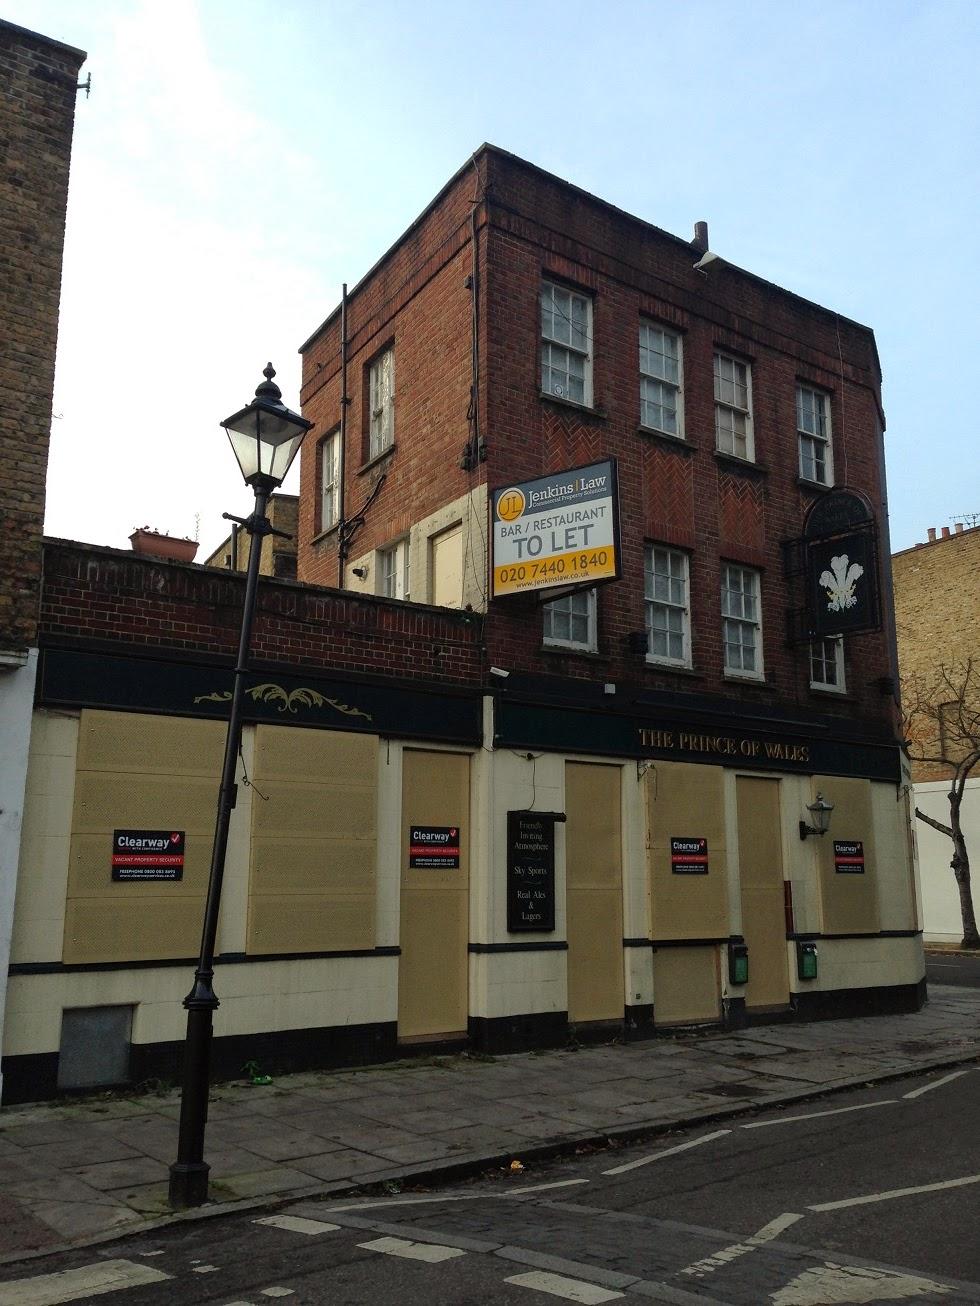 Abandoned pub, Islington, London